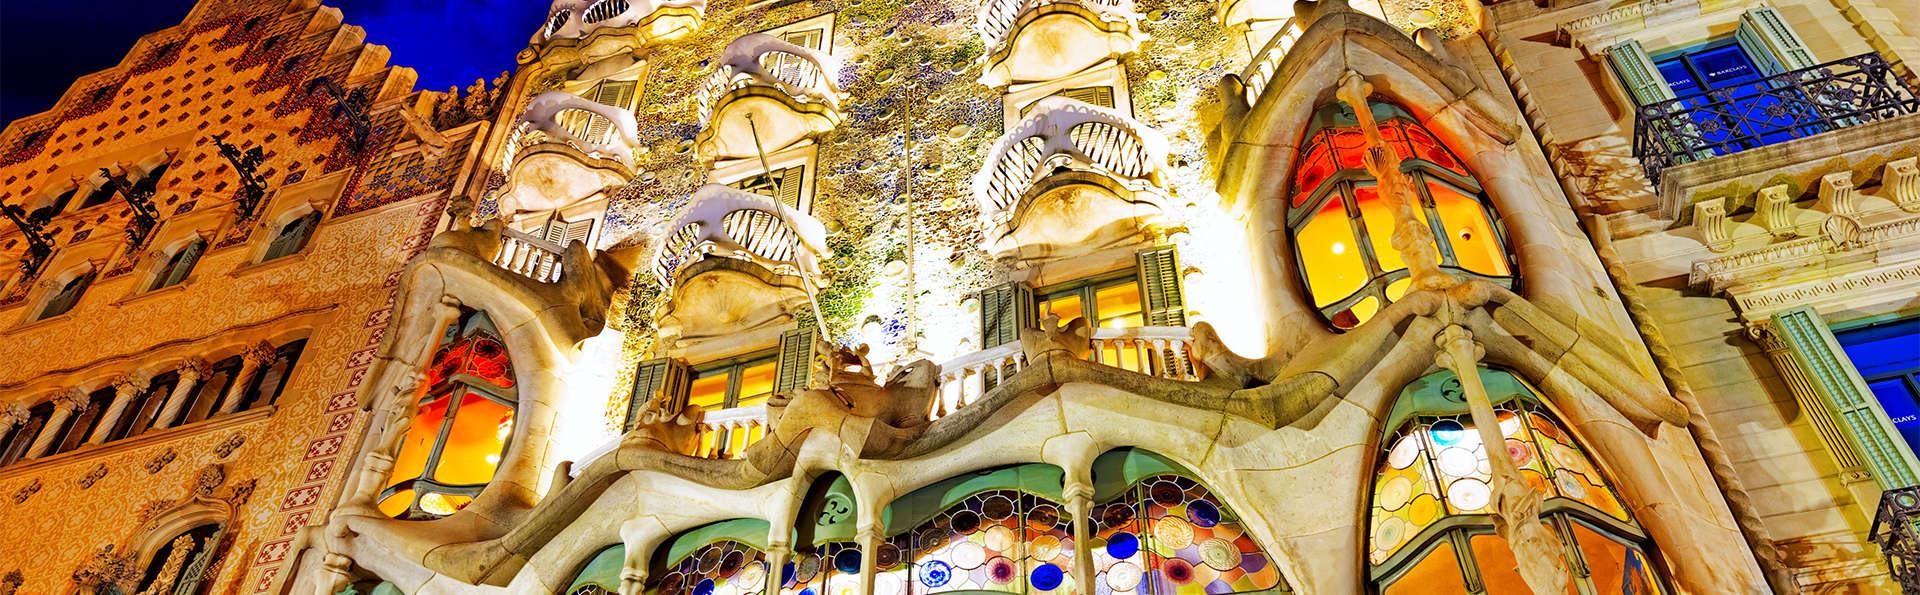 Sercotel Amister Art Hotel Barcelona - EDIT_20_PEDRERA.jpg